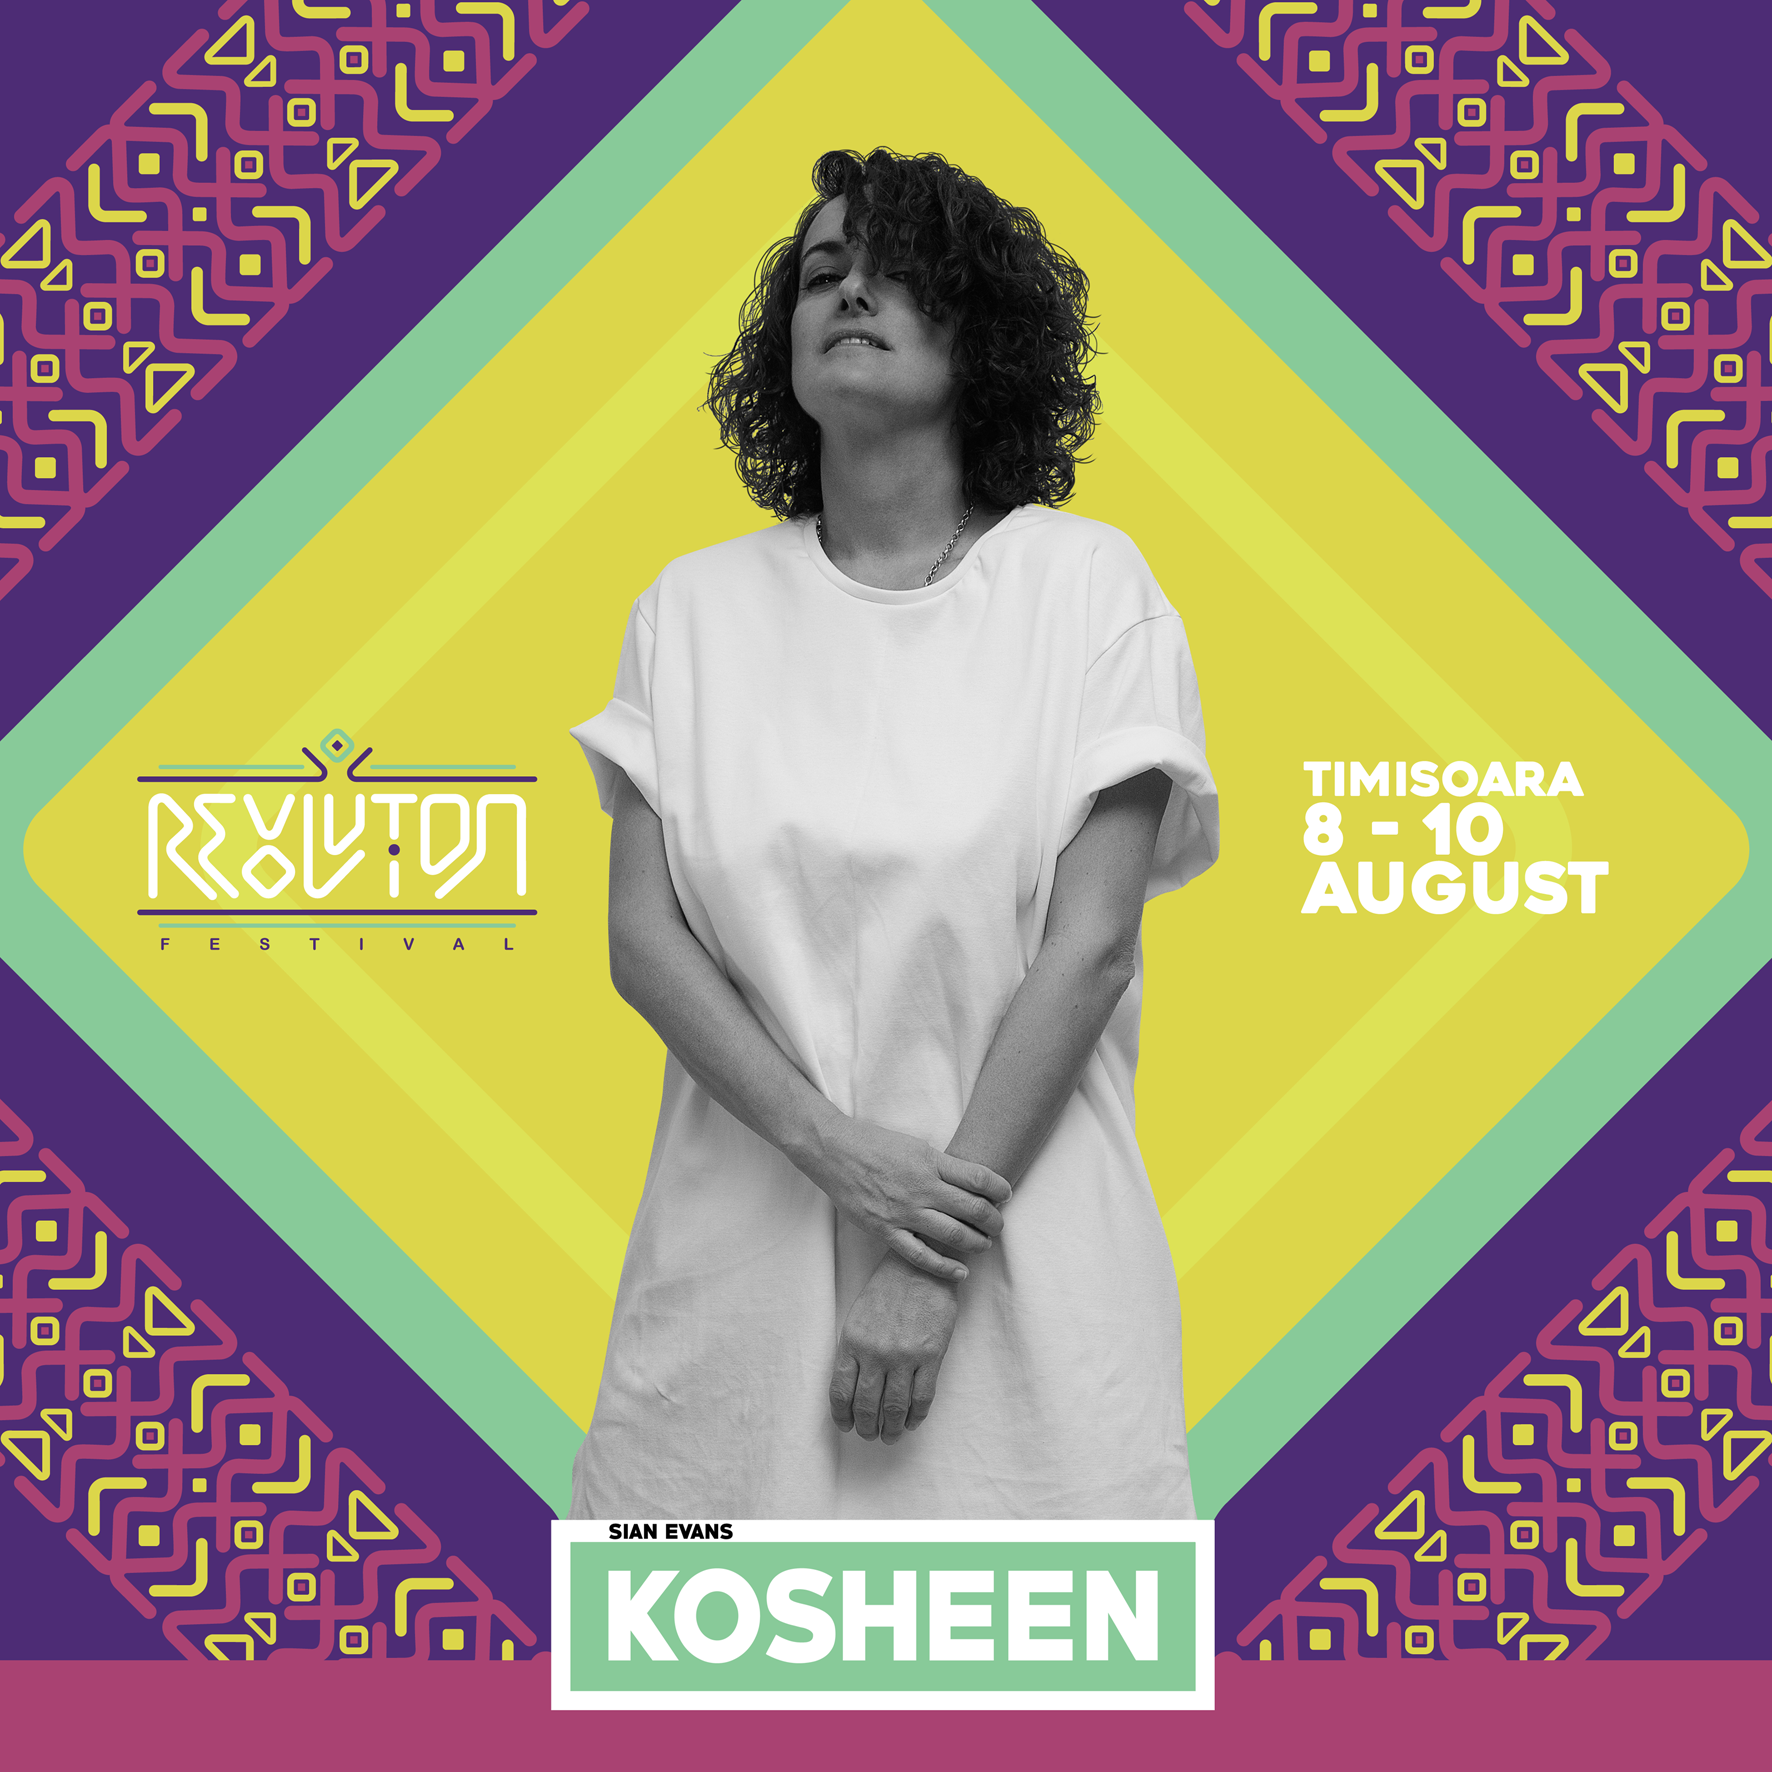 Revolution, Kosheen